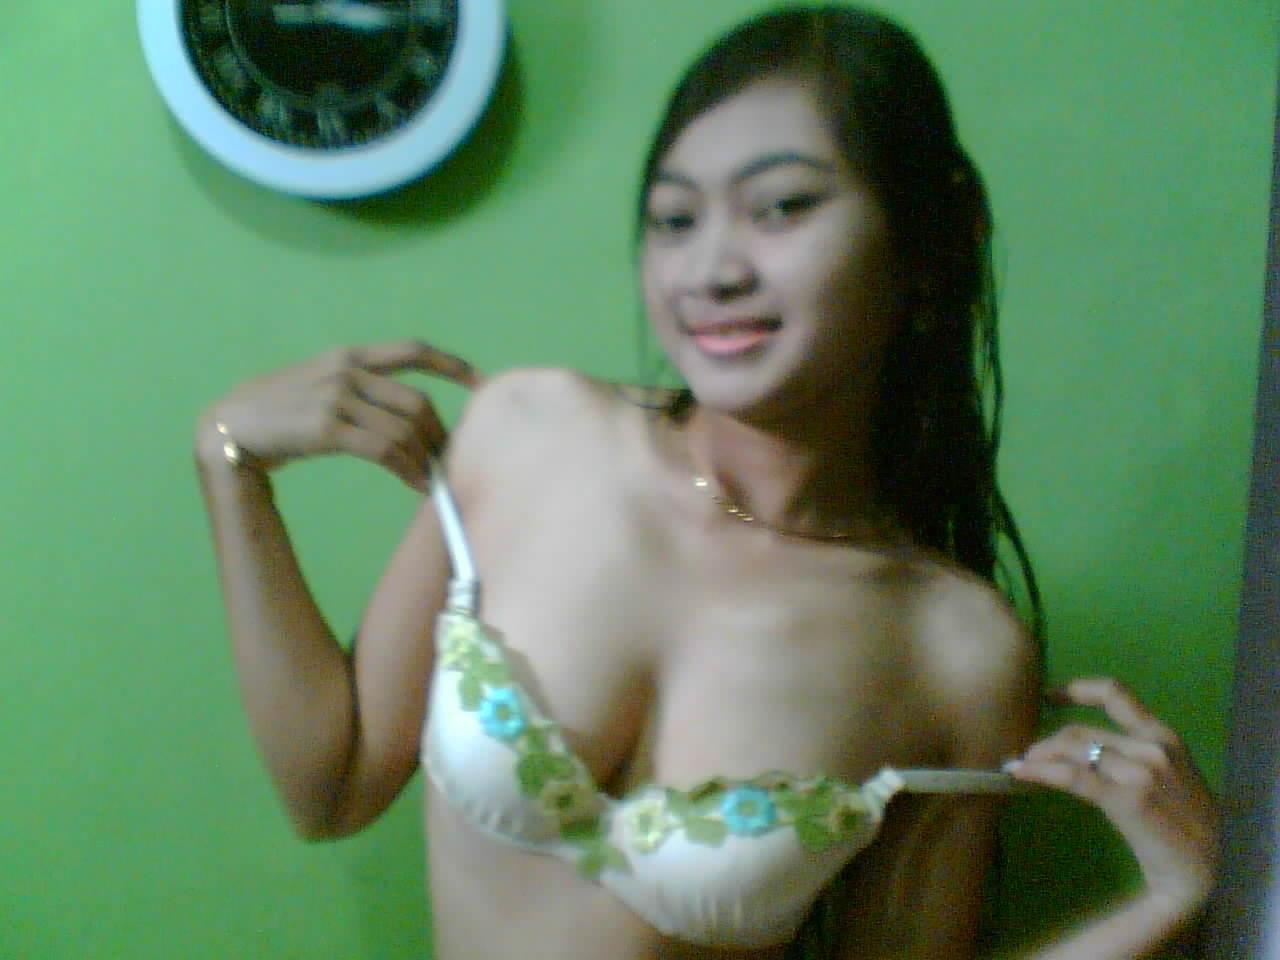 indonesian woman Hot